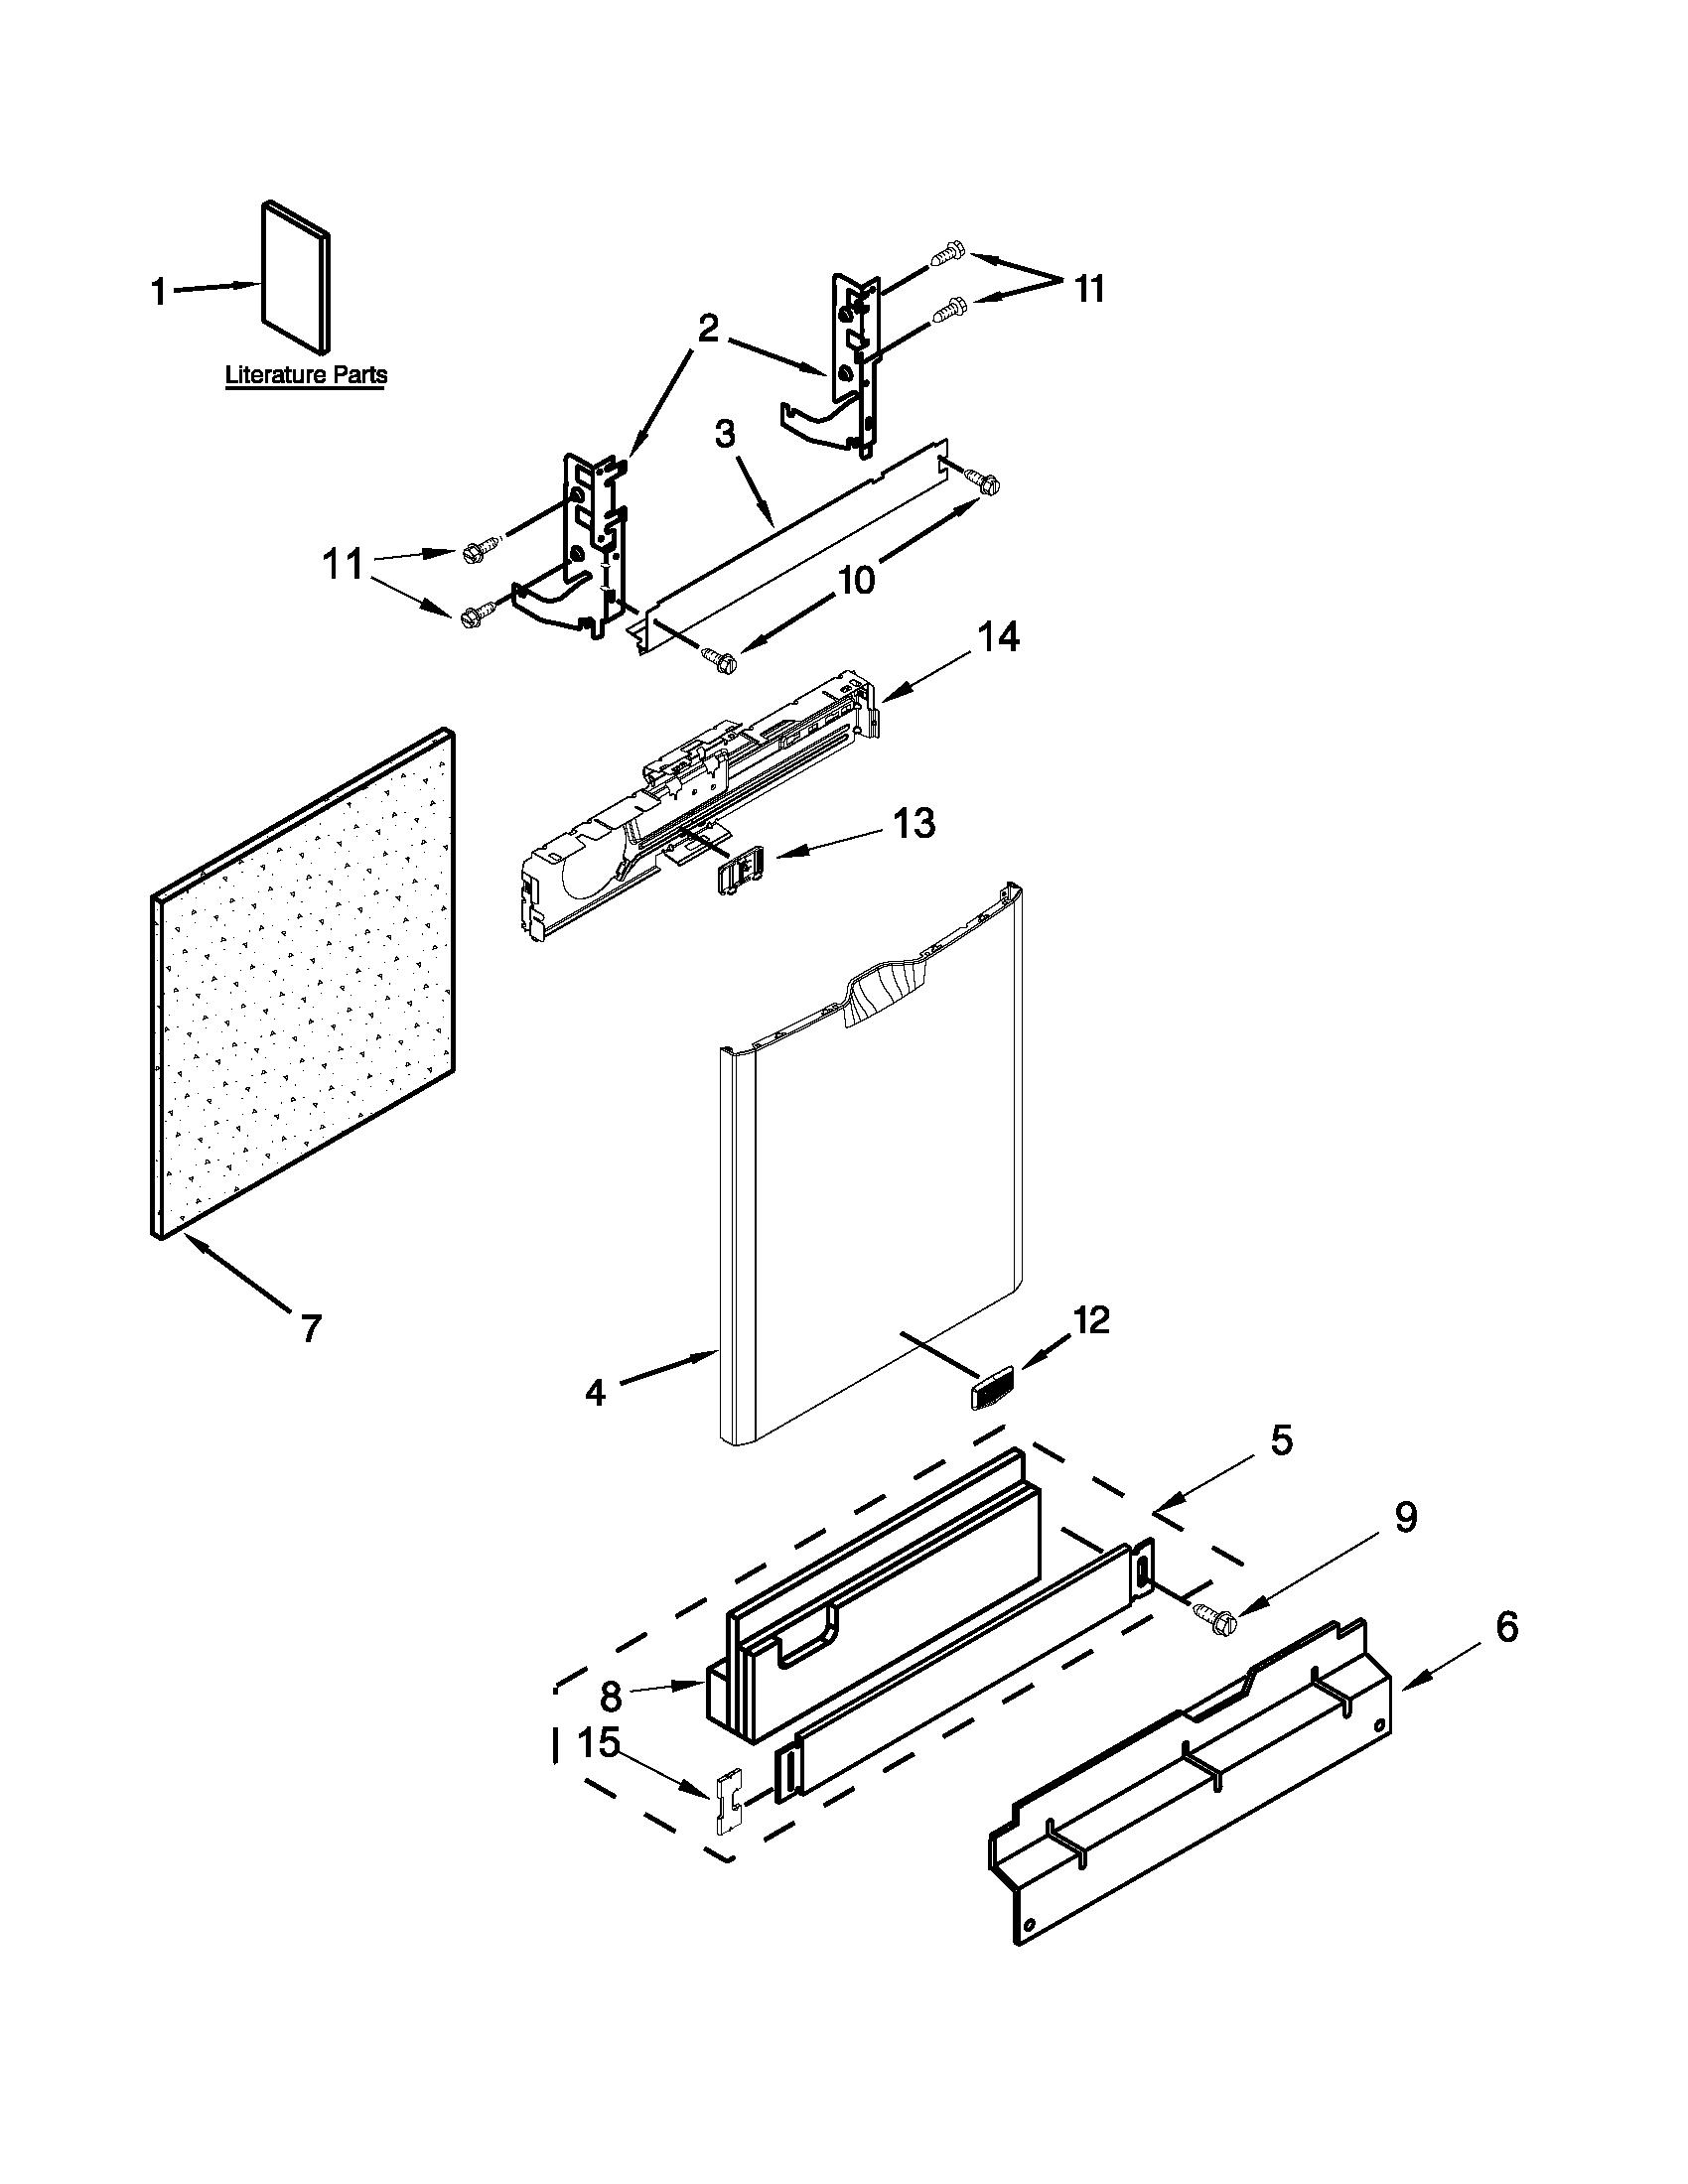 Maytag model MDB4949SDH1 dishwasher genuine parts